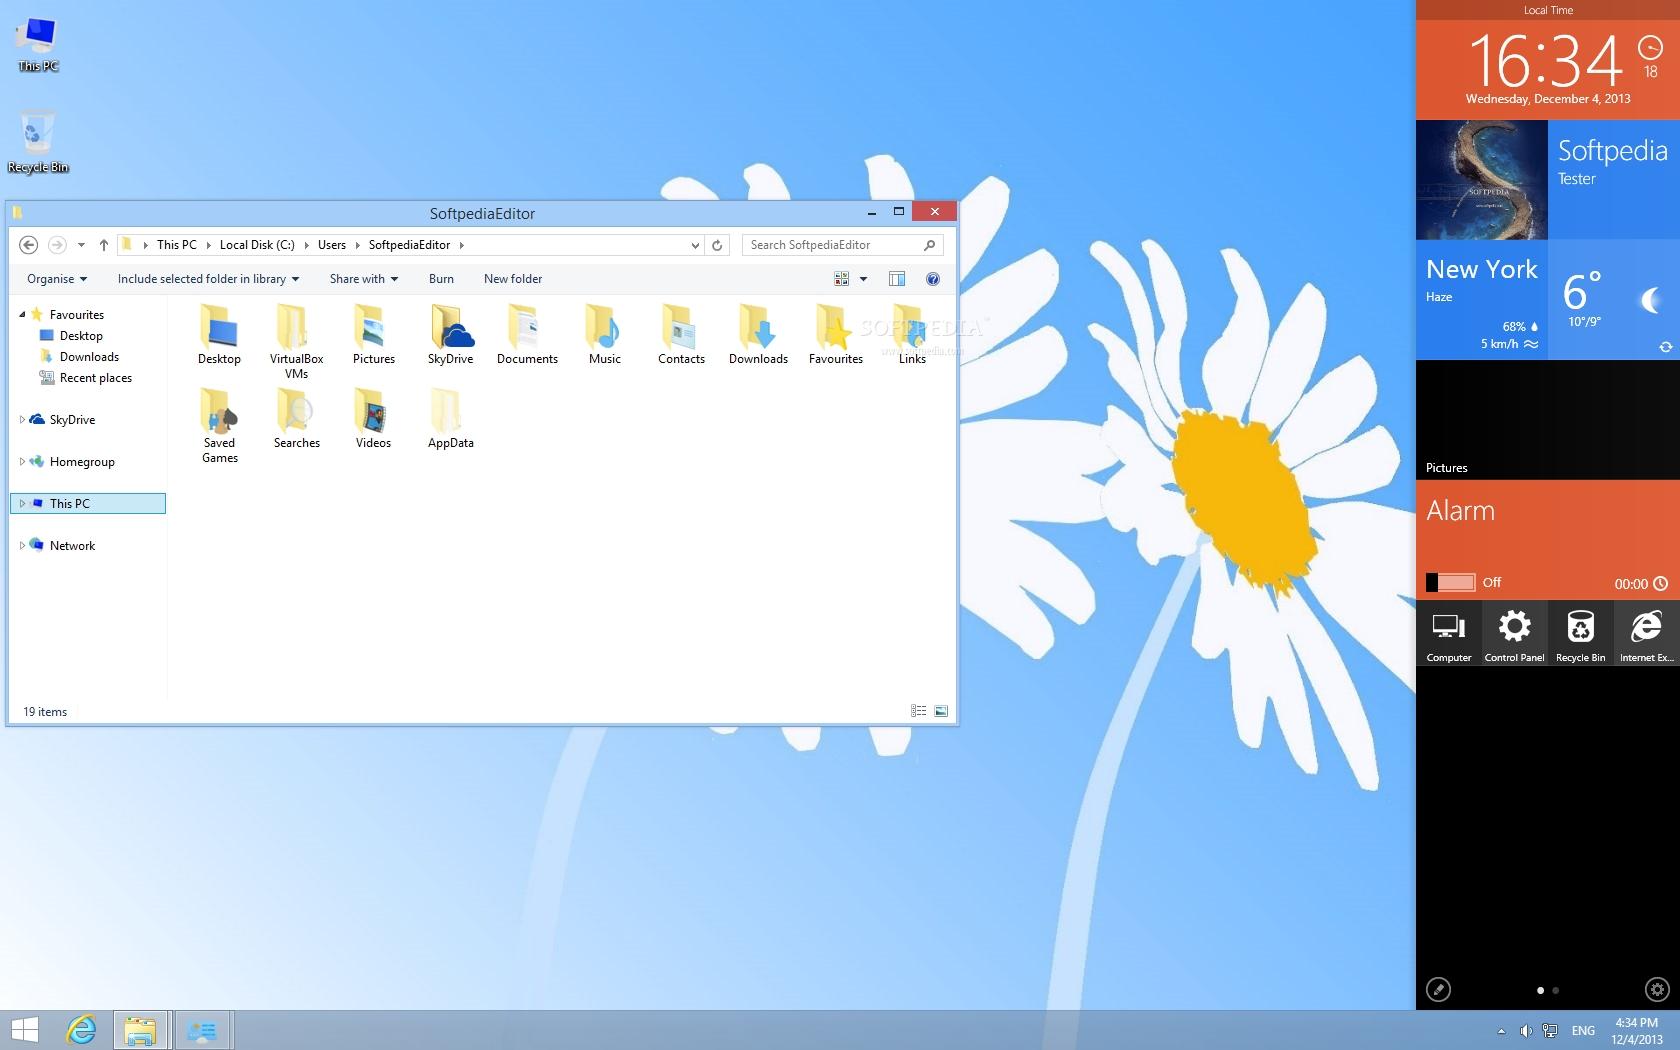 Windows 8.1 skin pack for xp